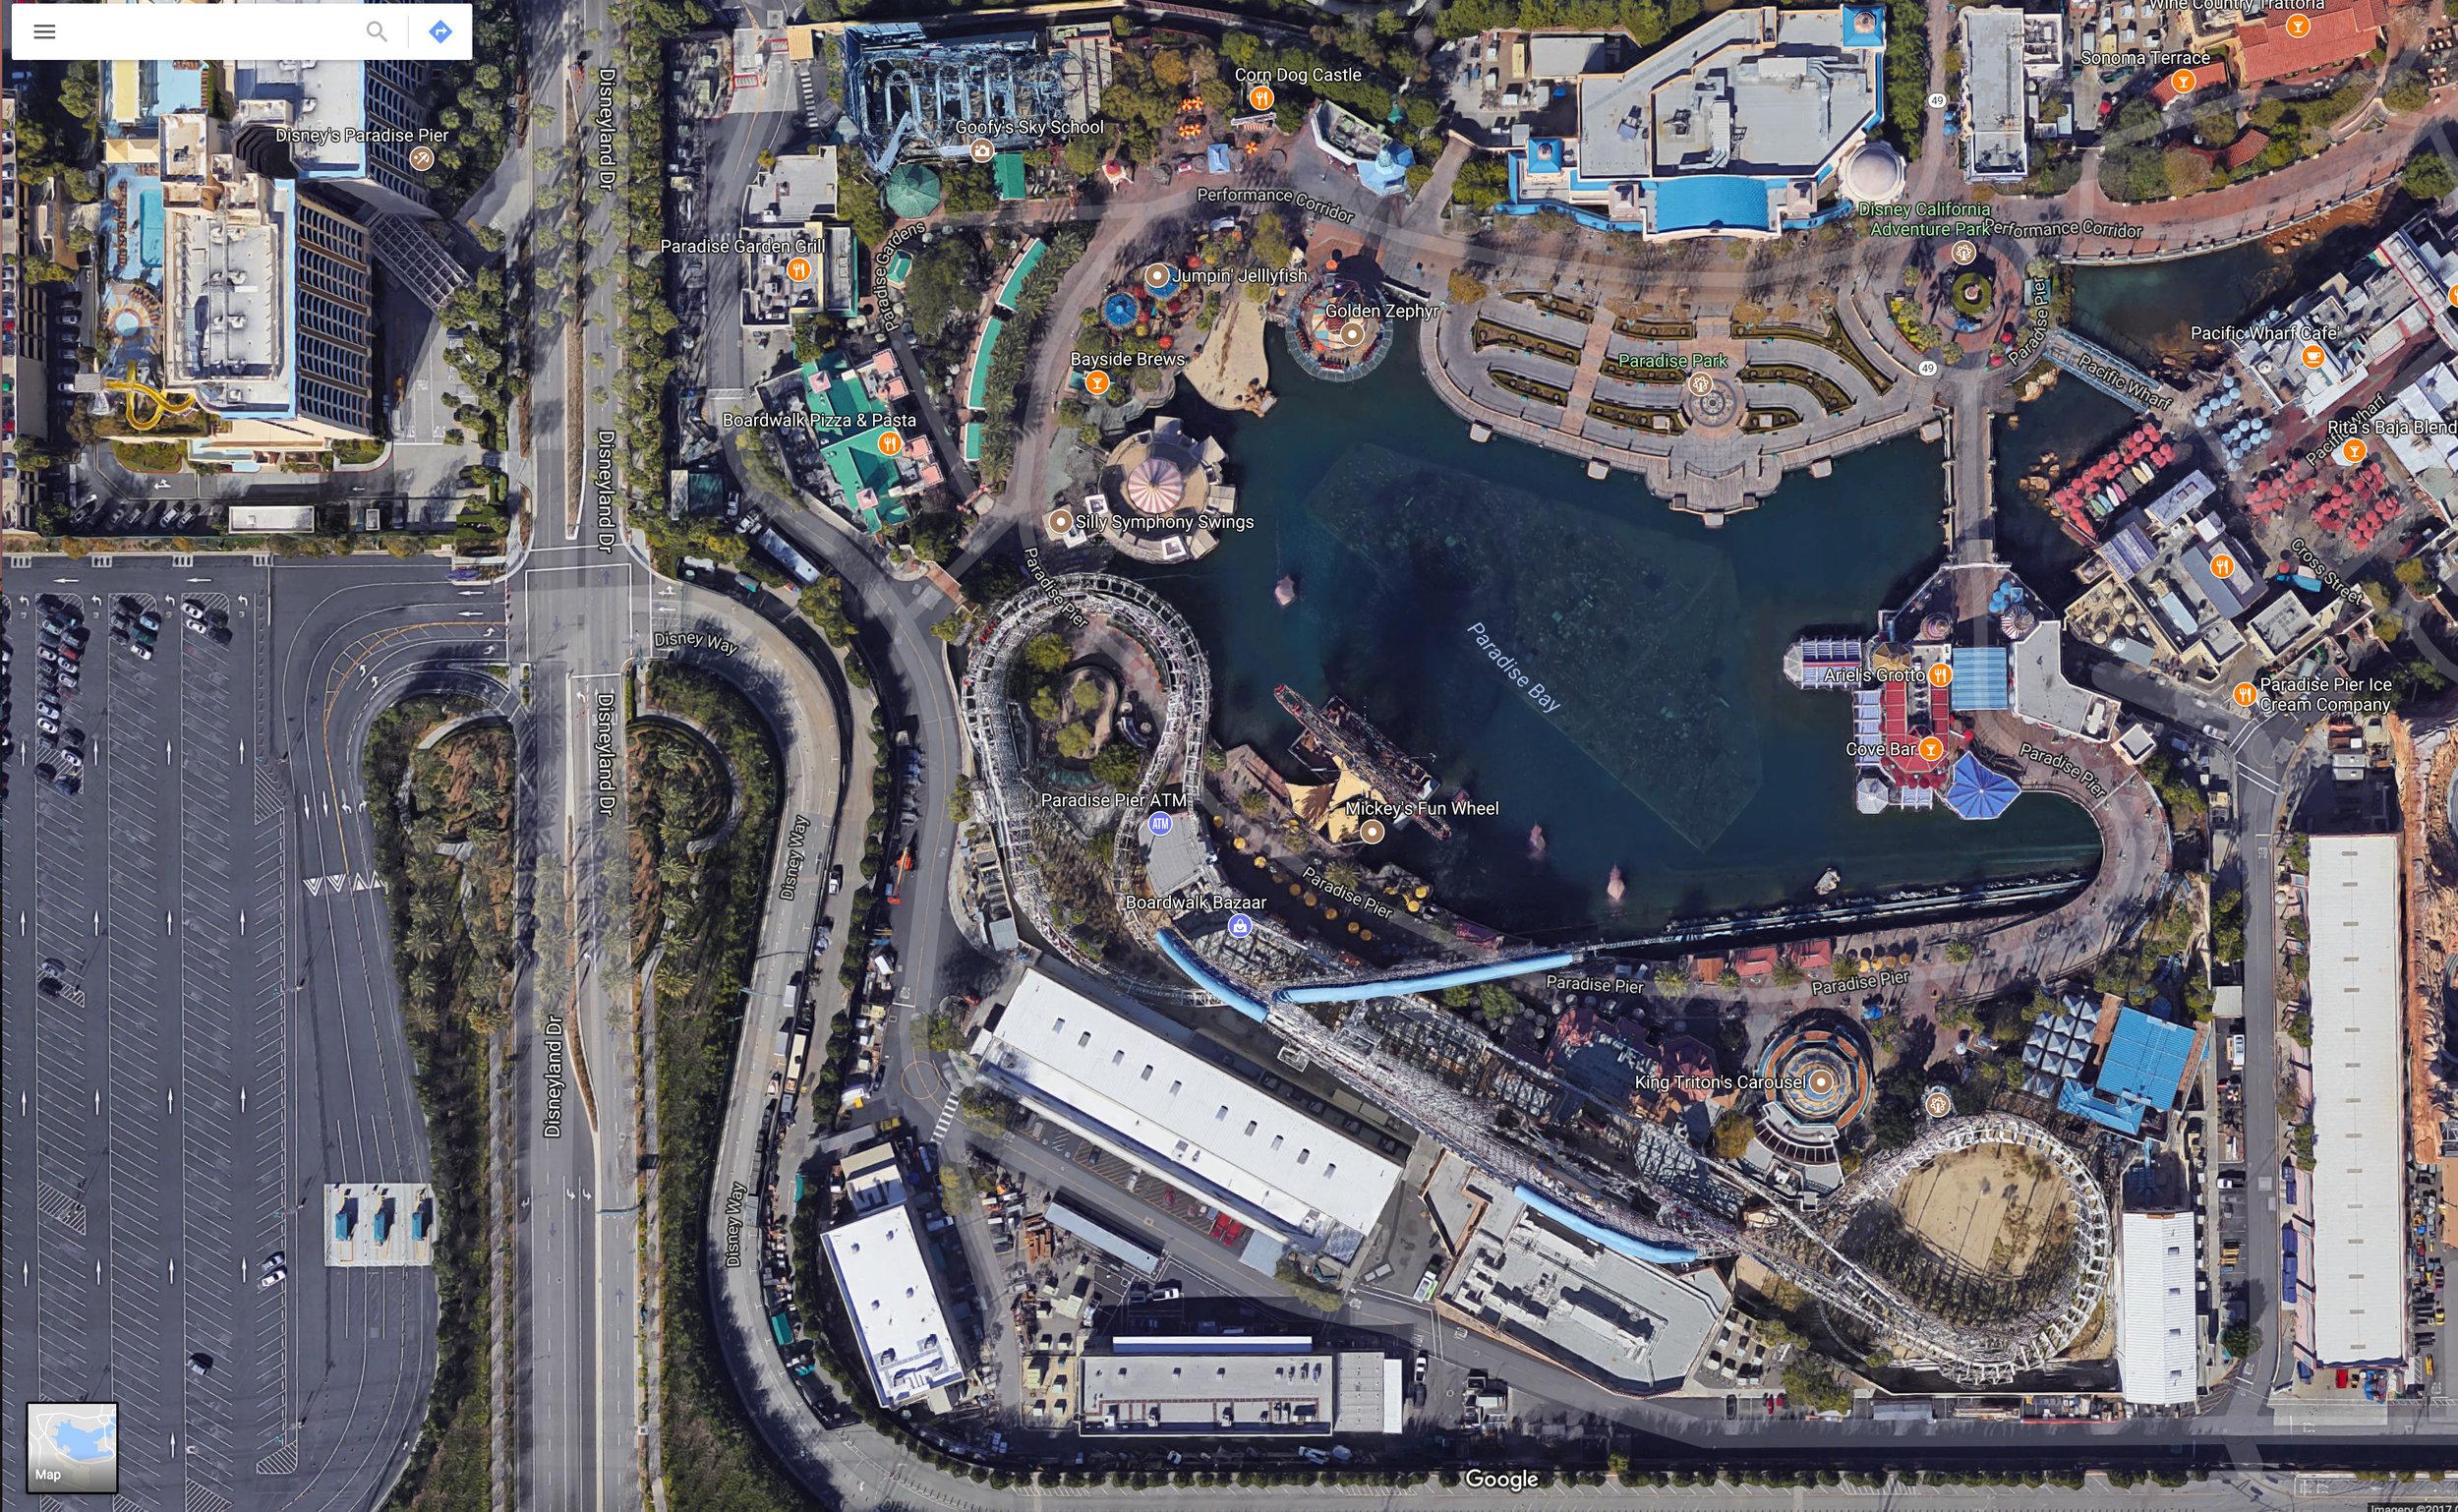 Satellite view of Pixar Pier